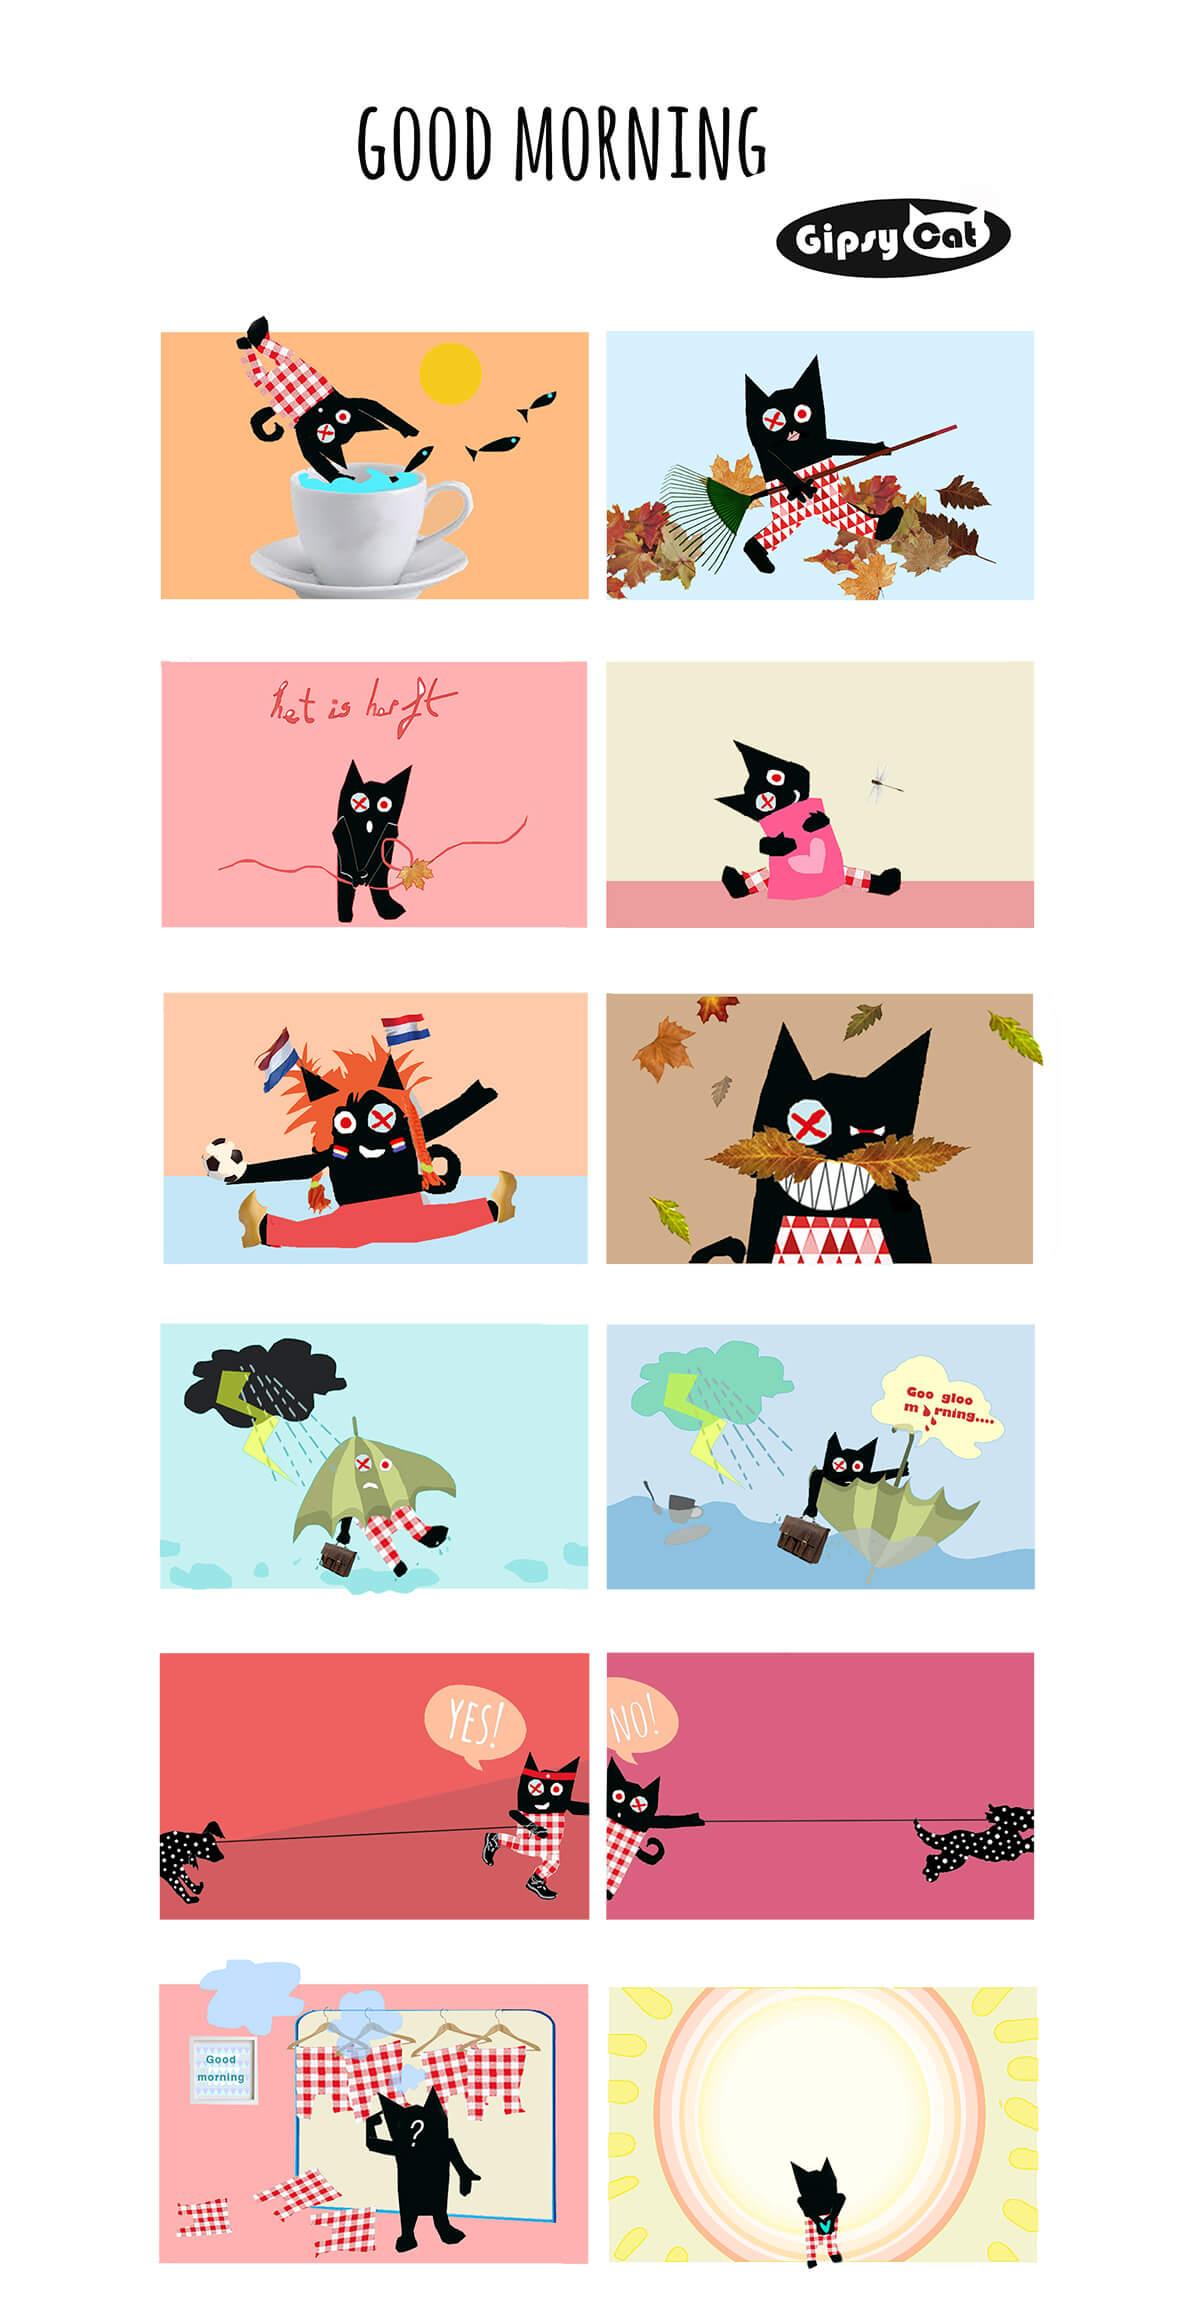 Good morning illustrations by Angeles Nieto